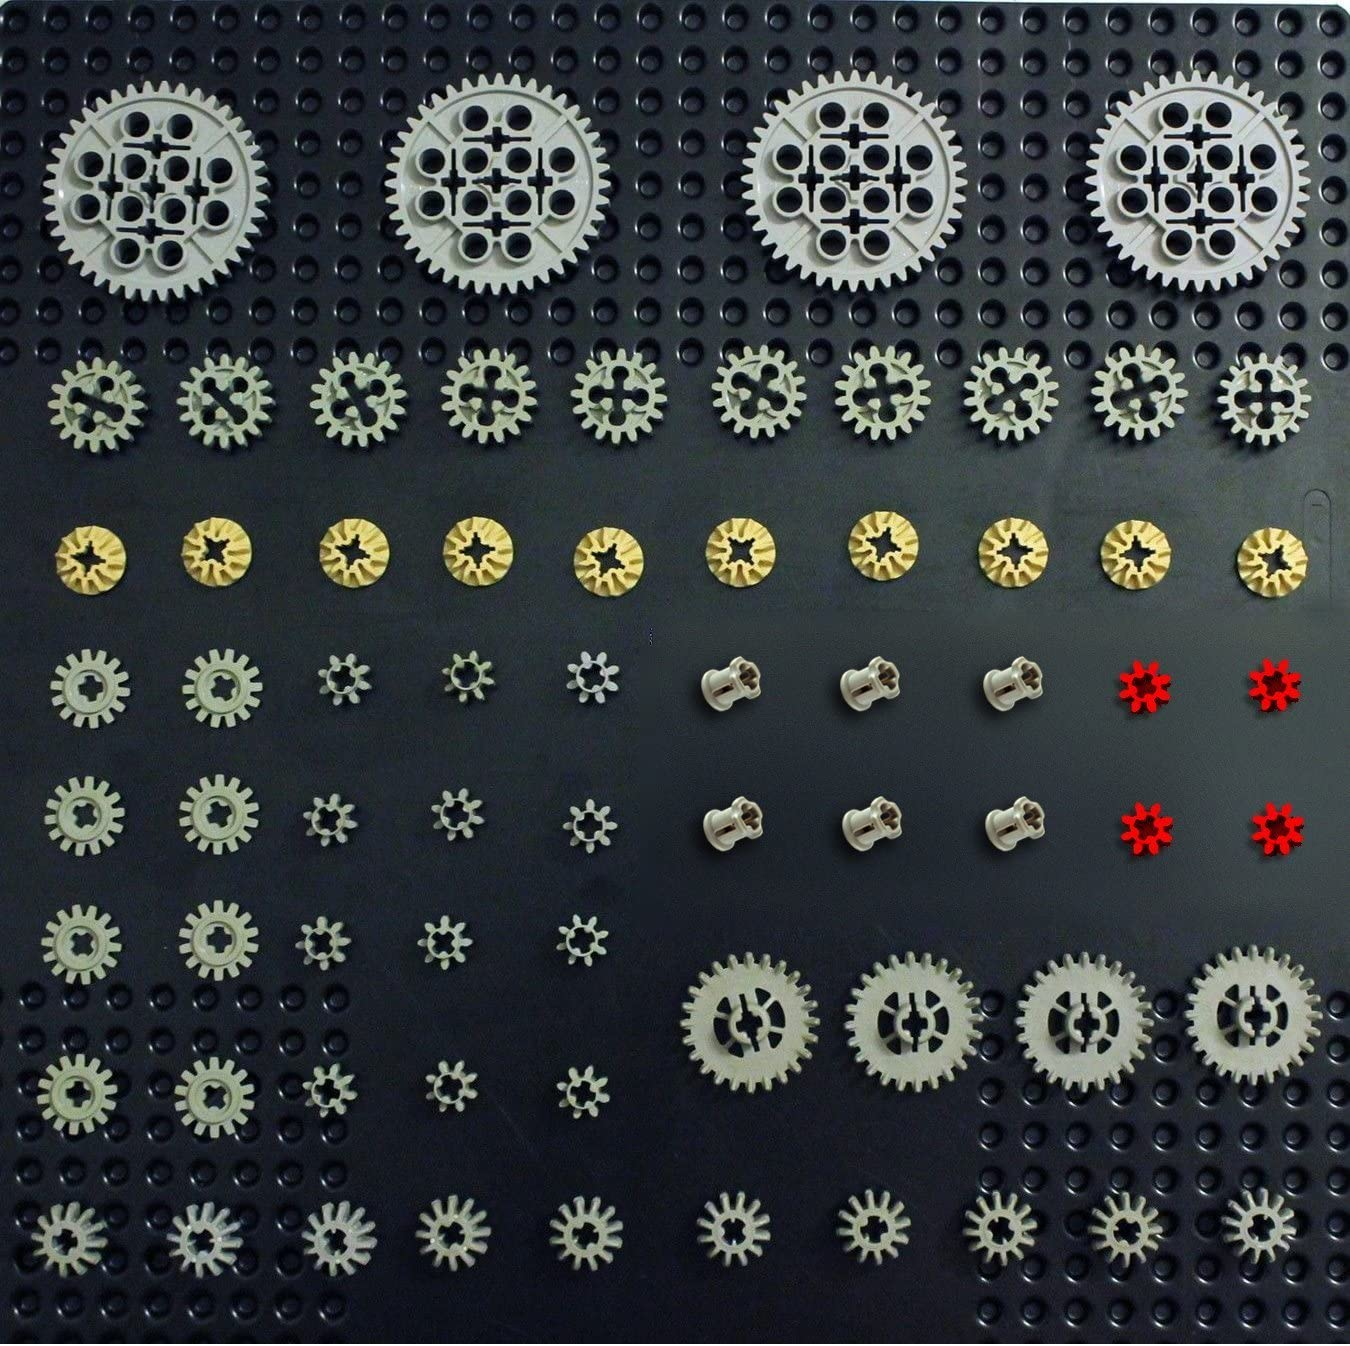 technic,mindstorms,nxt,ev3,robot,gear,bush,connector,car Lego AXLES Sample Kit